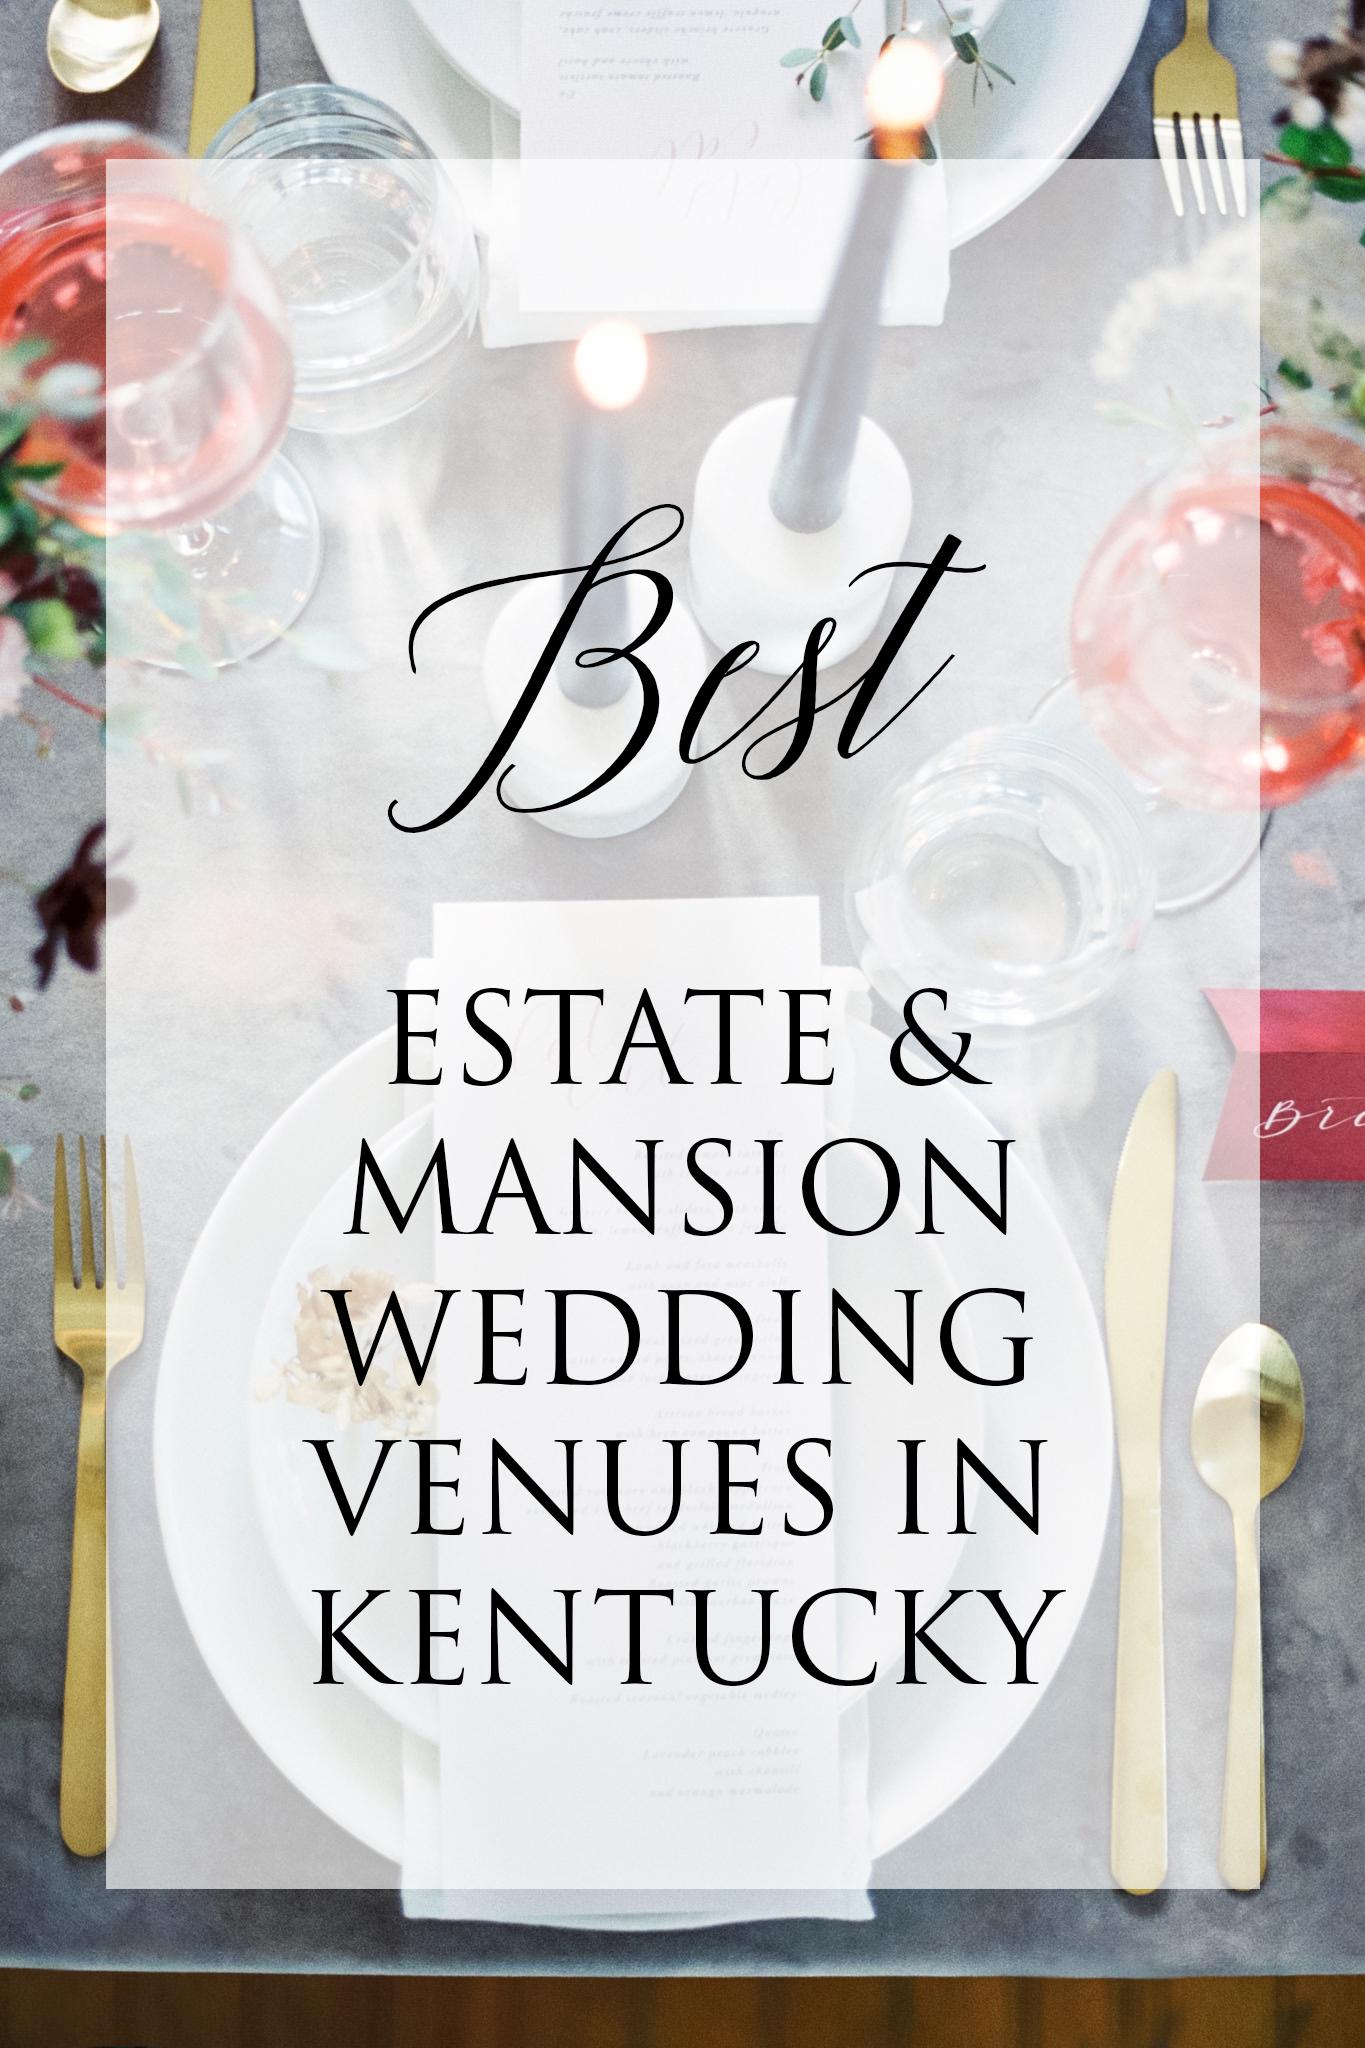 Best Estate & Mansion Wedding Venues in Kentucky